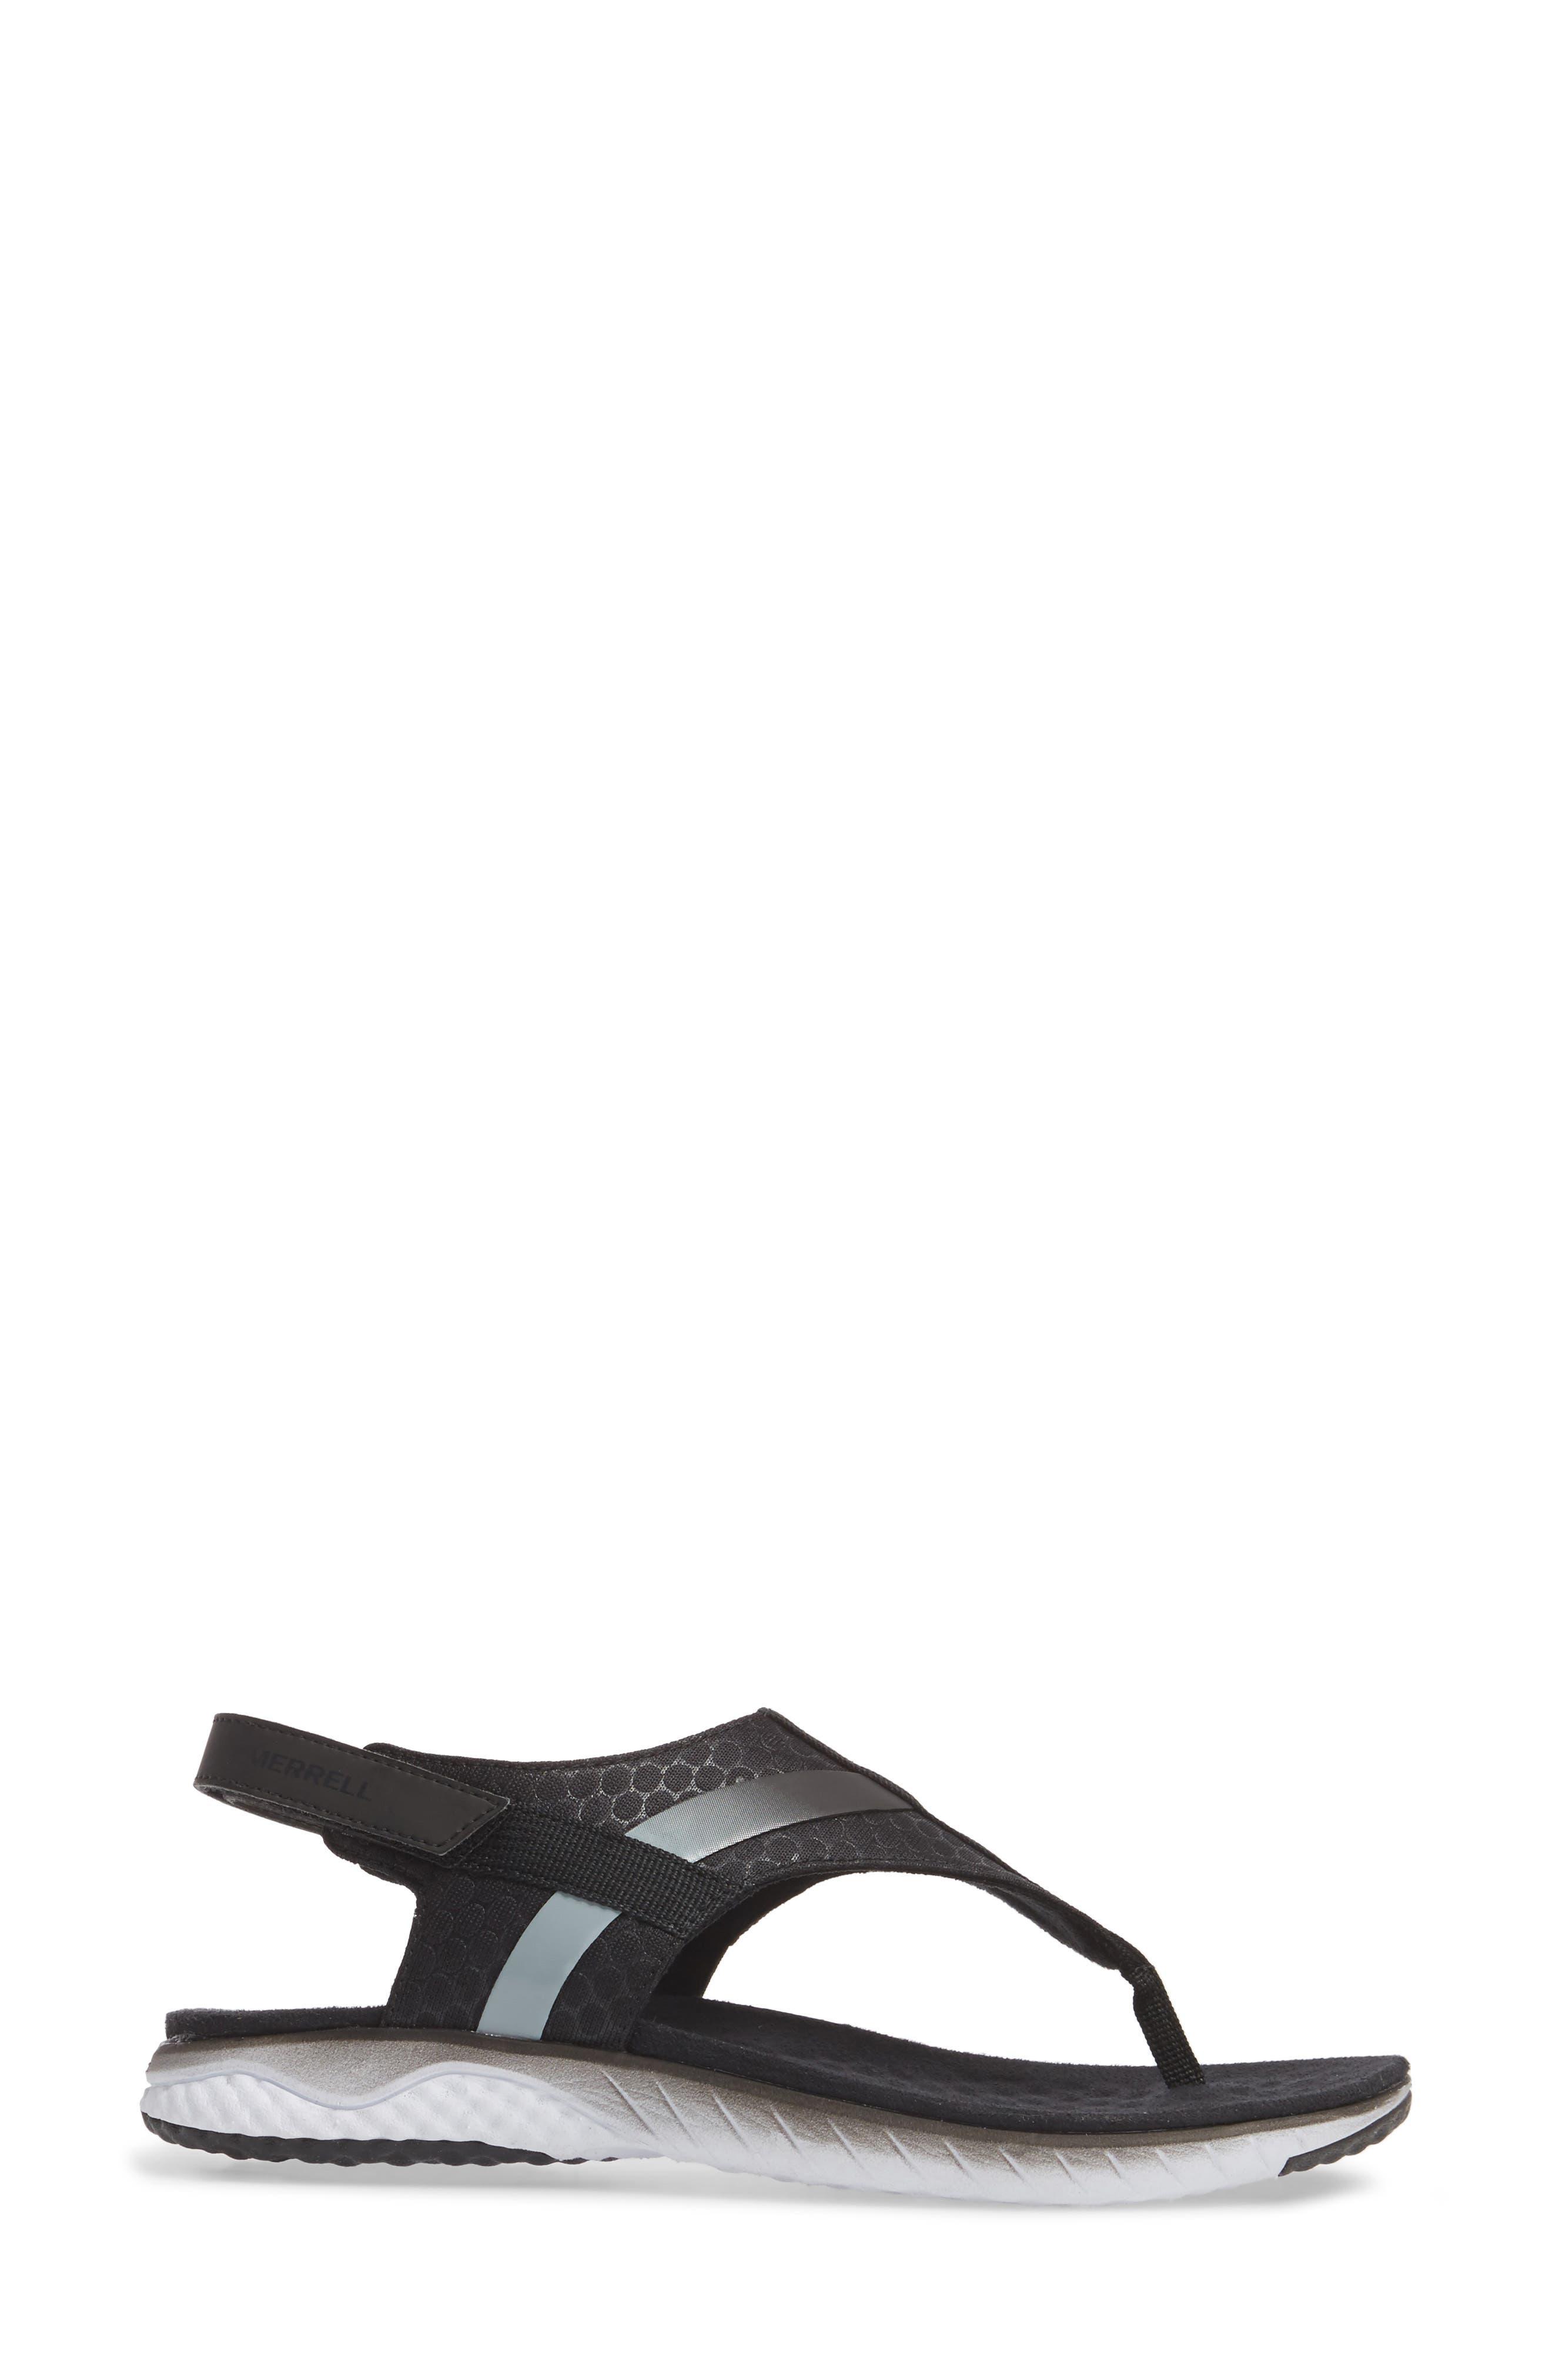 1SIX8 Linna Slide Air Cushion+ Sandal,                             Alternate thumbnail 3, color,                             001